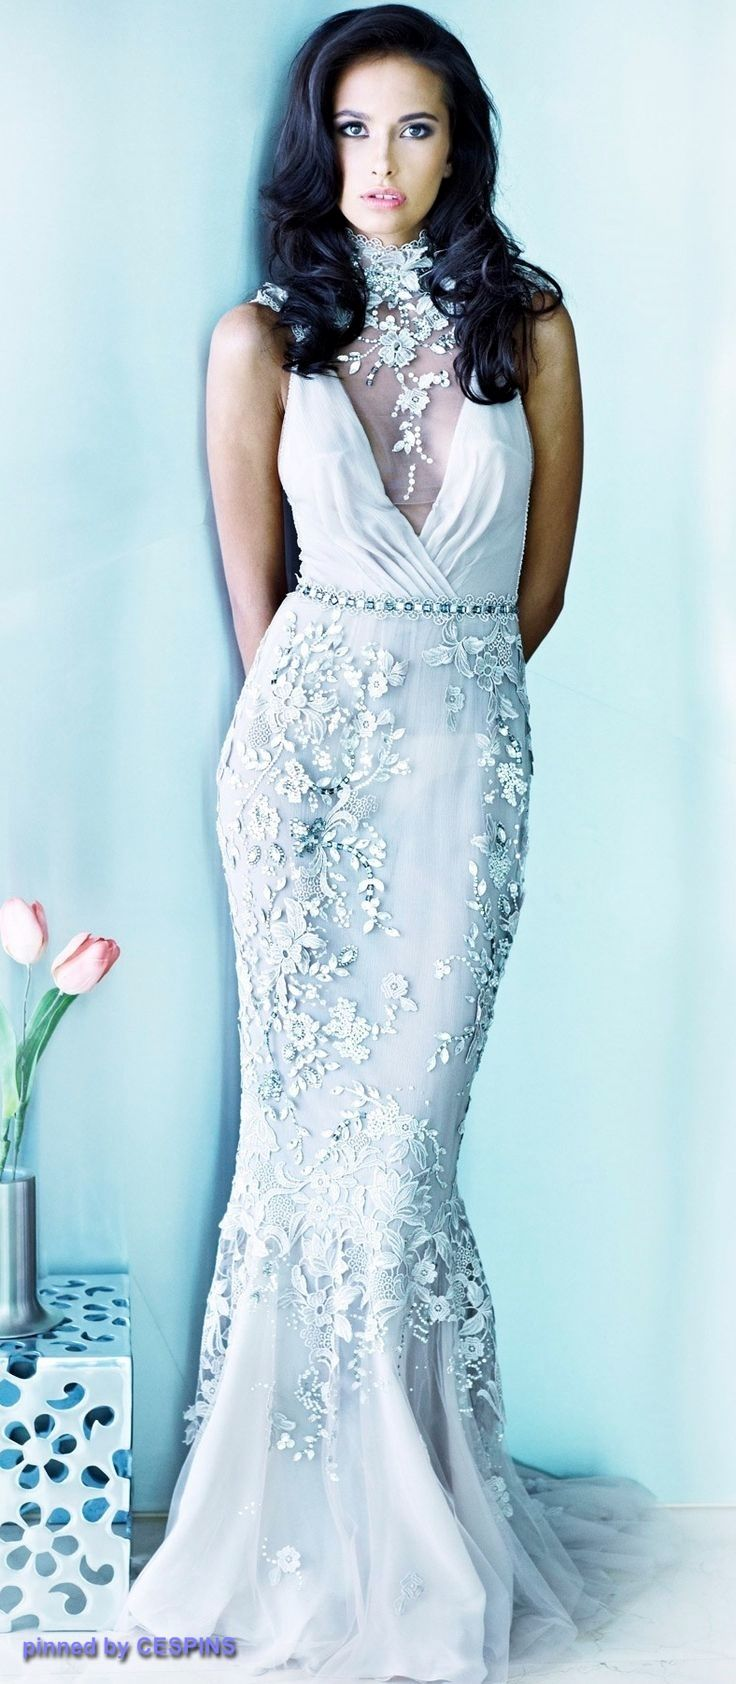 14 best My Wedding :) images on Pinterest | Wedding frocks, Short ...